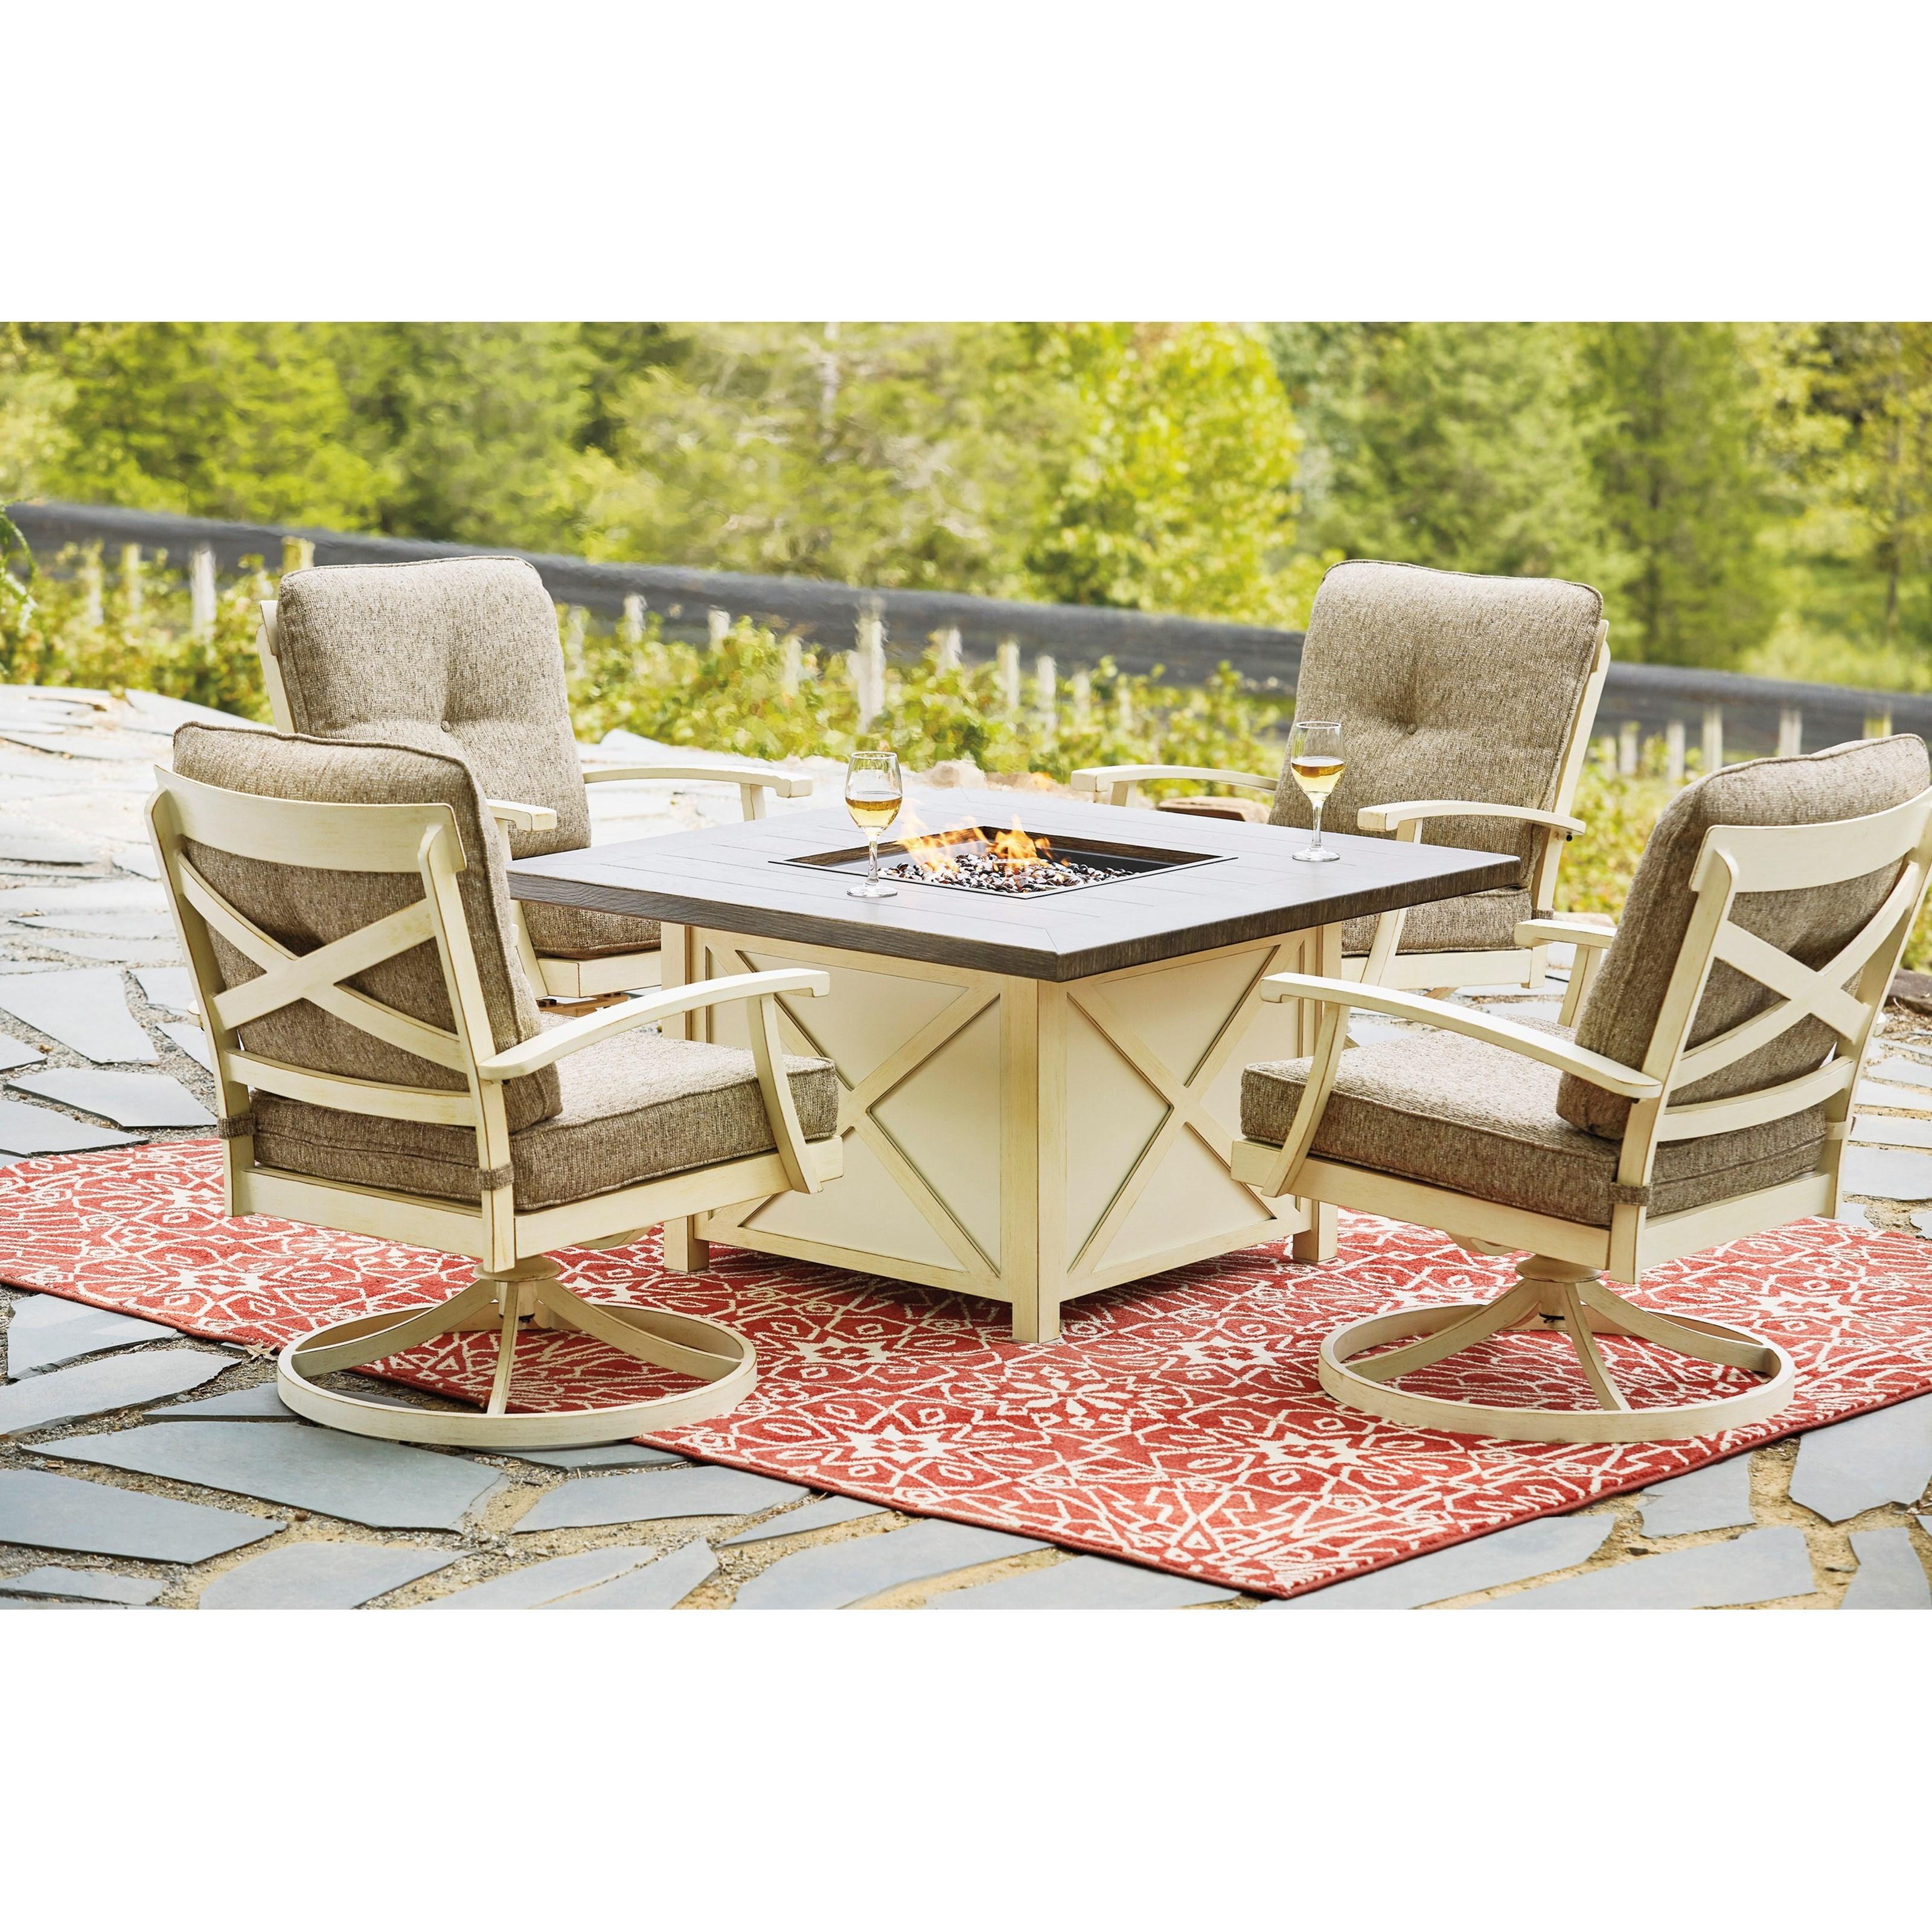 preston bay outdoor firepit table set